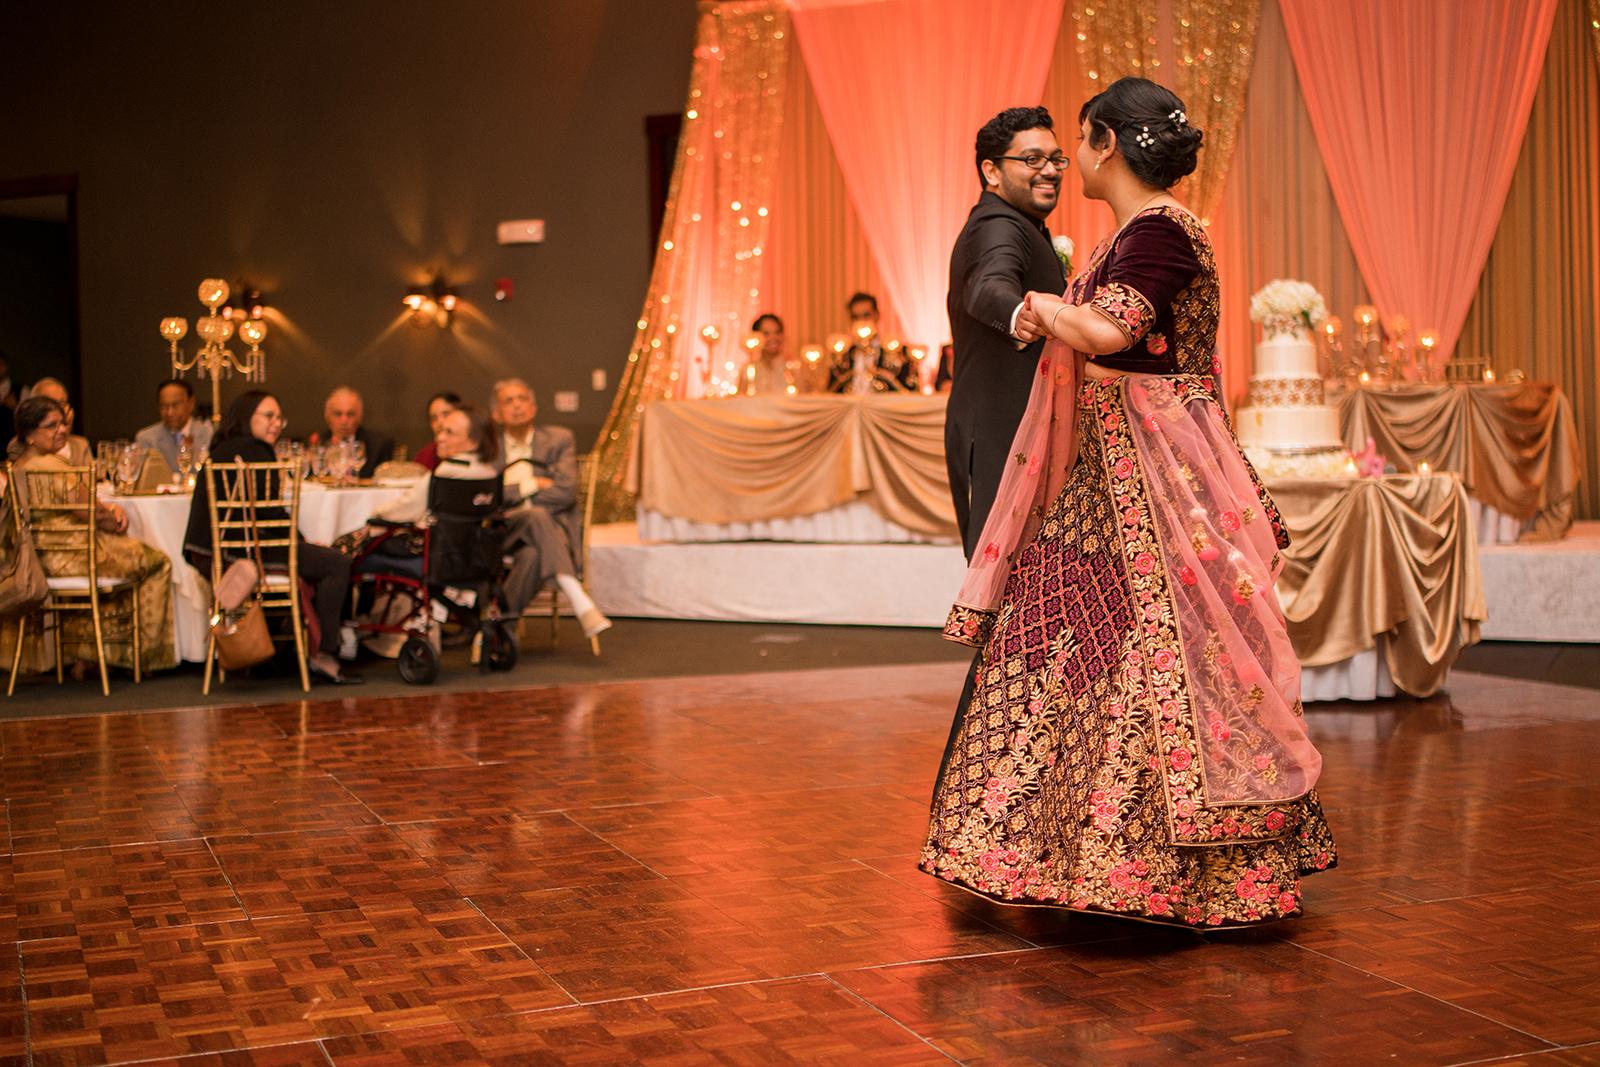 Le Cape Weddings - South Asian Wedding - Ishani and Sidhart - Wedding Reception-61.jpg